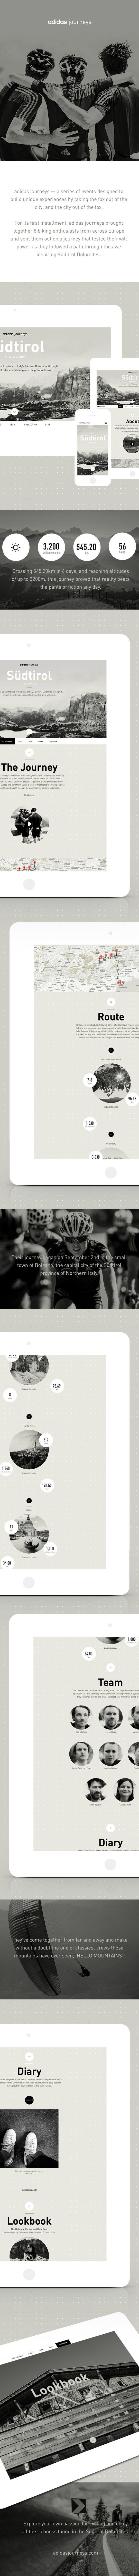 Adidas Journeys by Stefan Schuster, via Behance